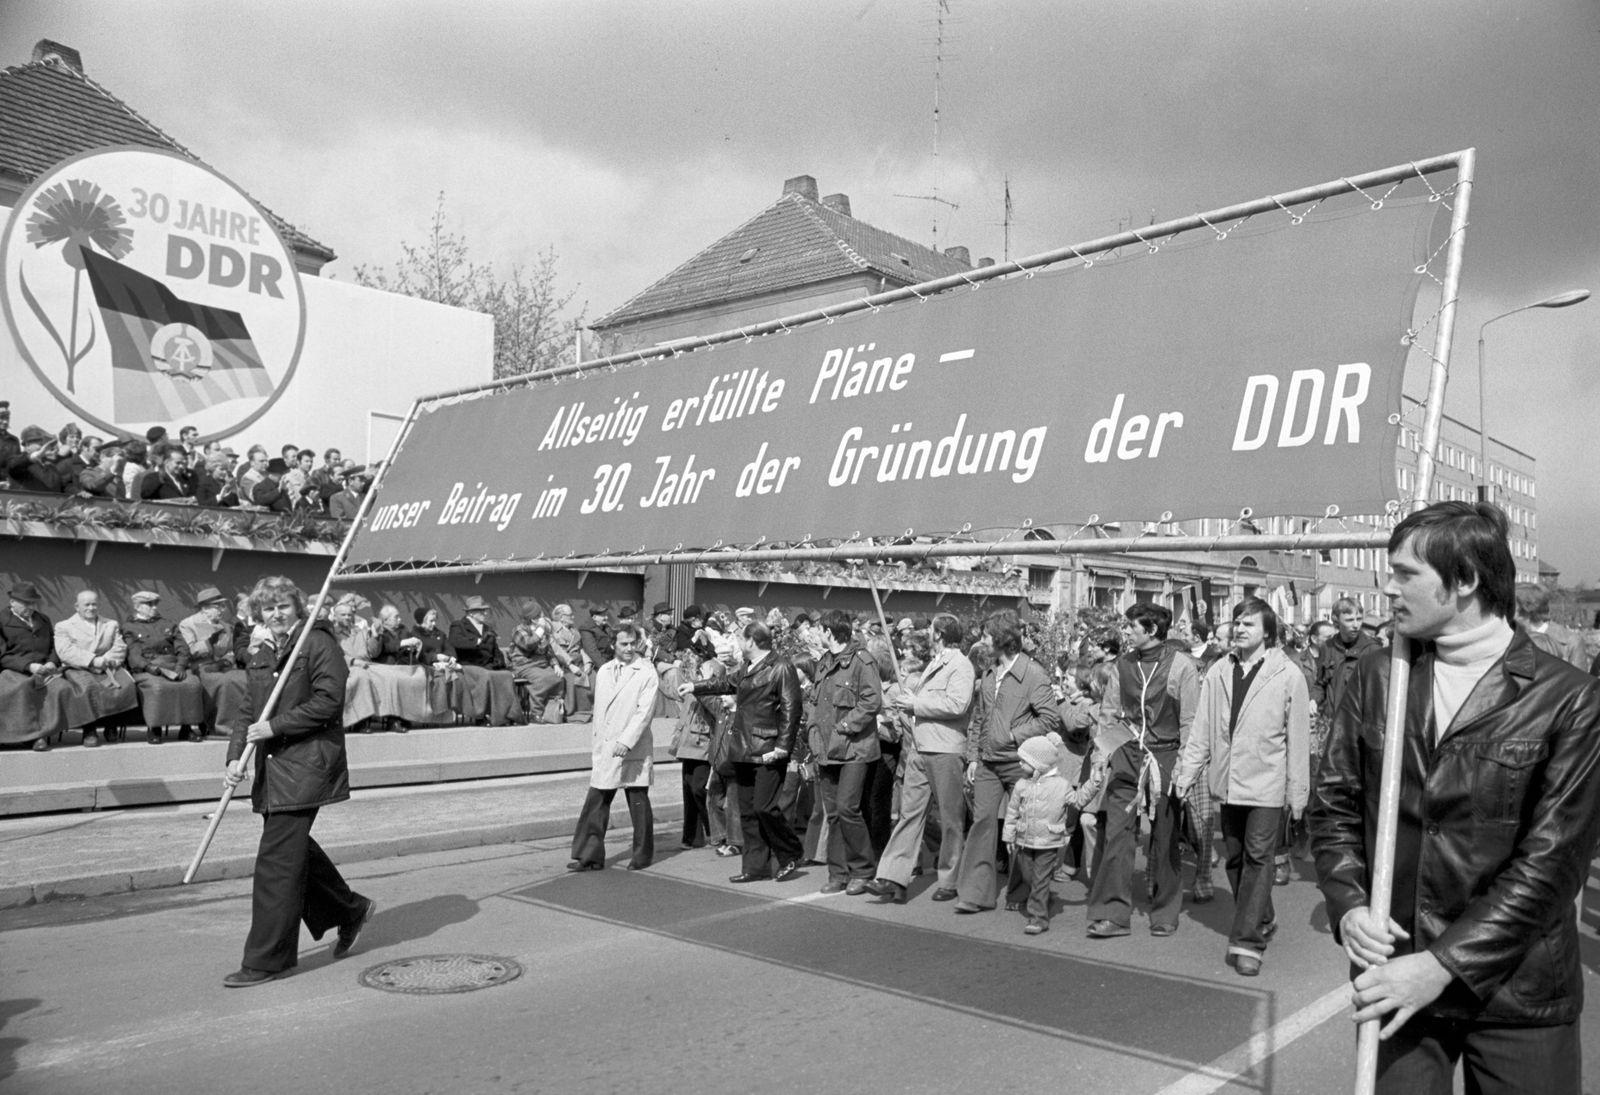 DDR - Maidemonstration